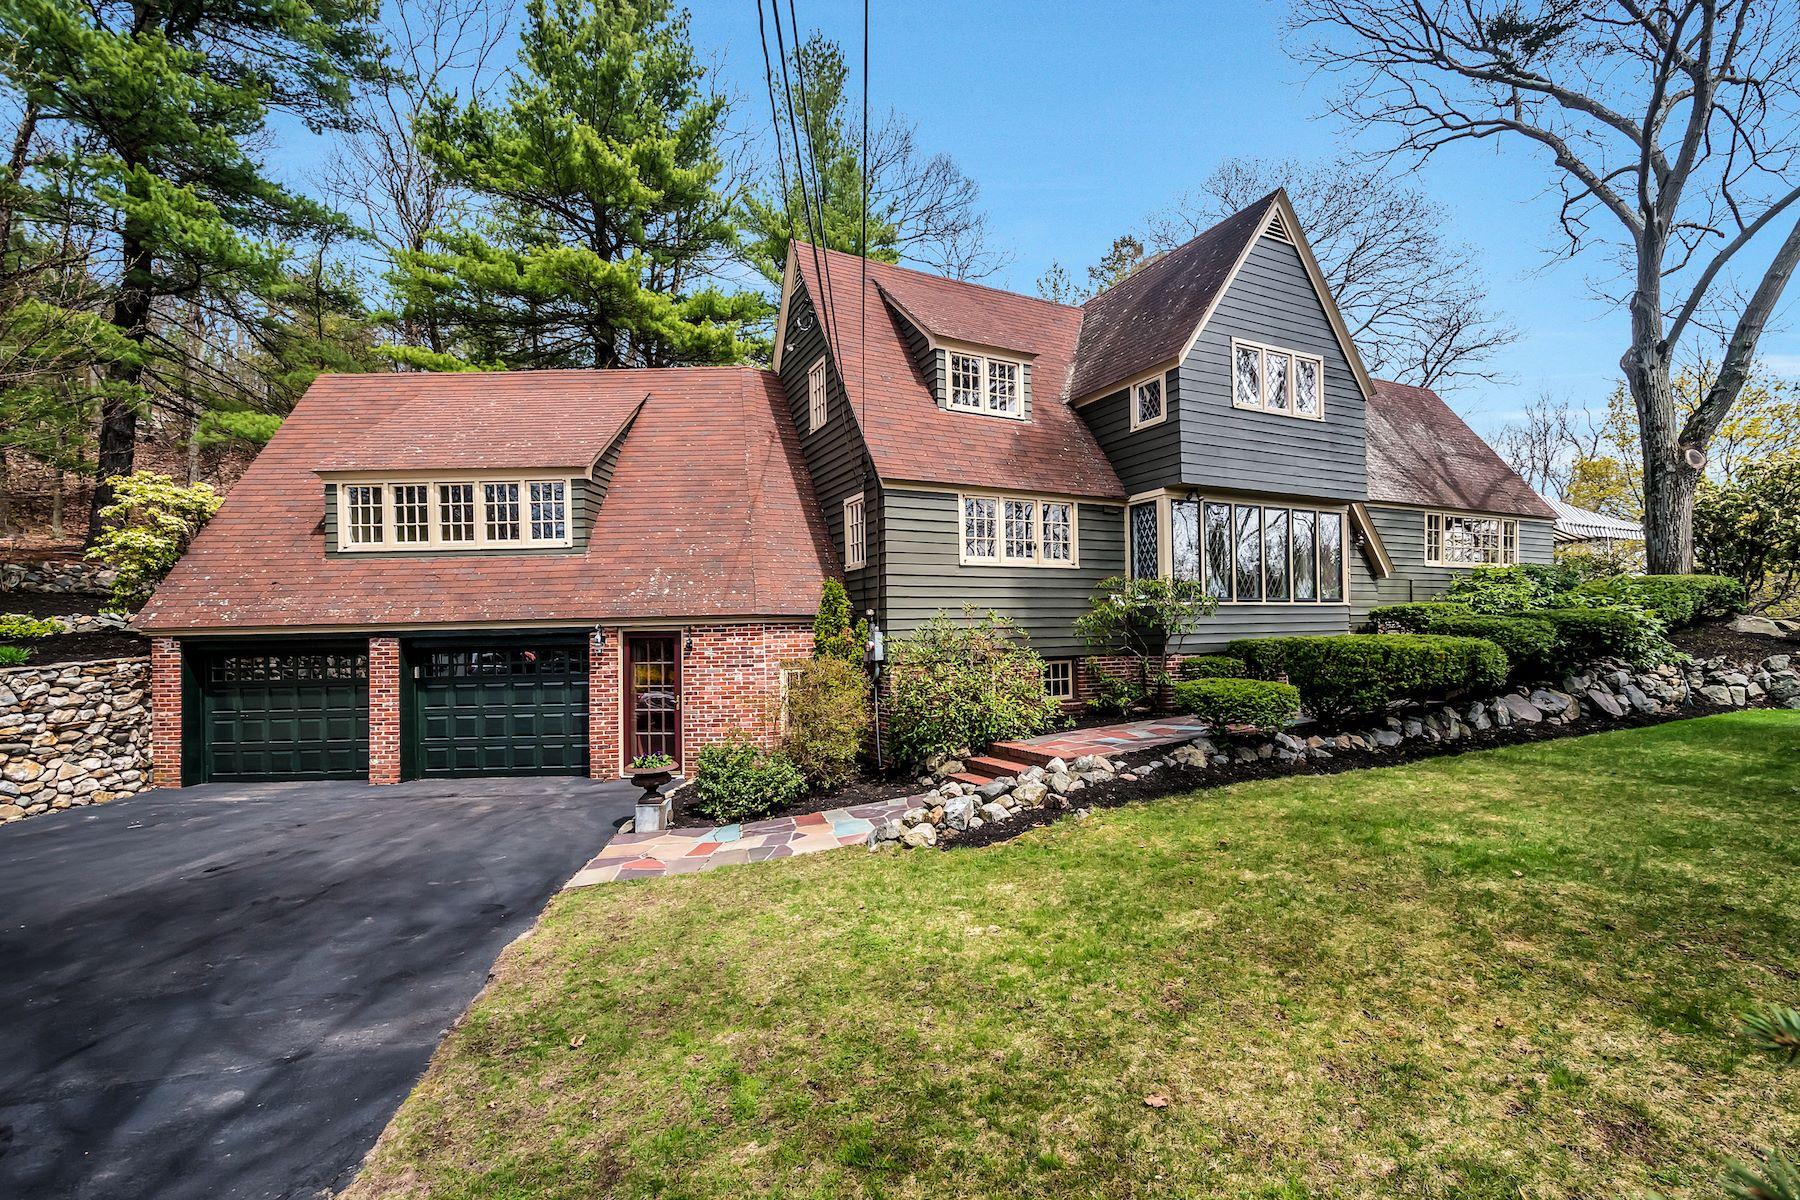 Moradia para Venda às Beautiful Colonial nestled on an acre+ of land 129 High Street Winchester, Massachusetts, 01890 Estados Unidos